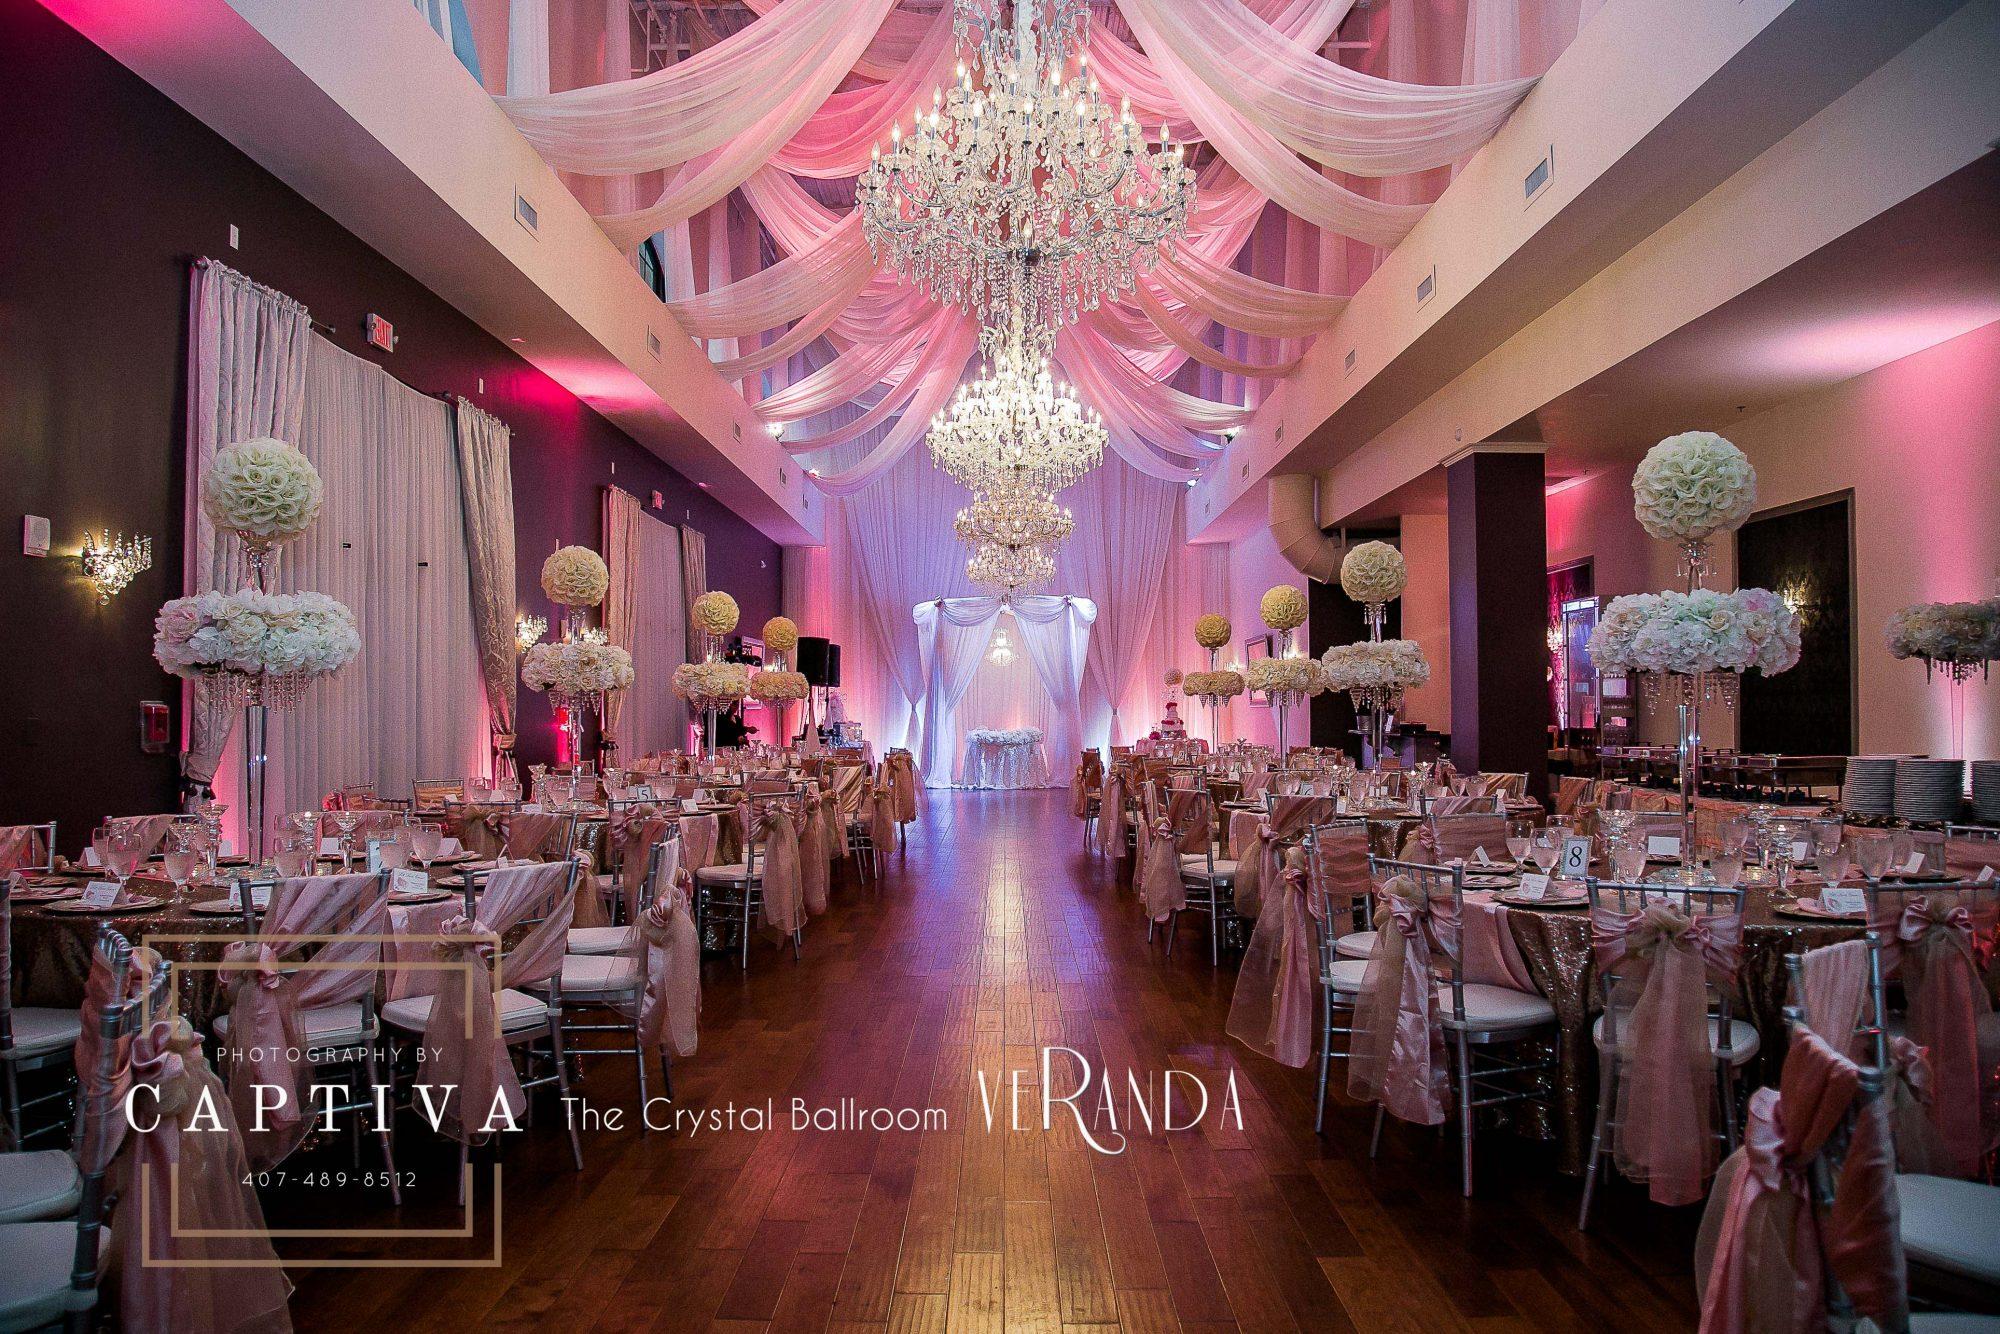 The Crystal Ballroom Floridas Premier Wedding Venue And Event Hall